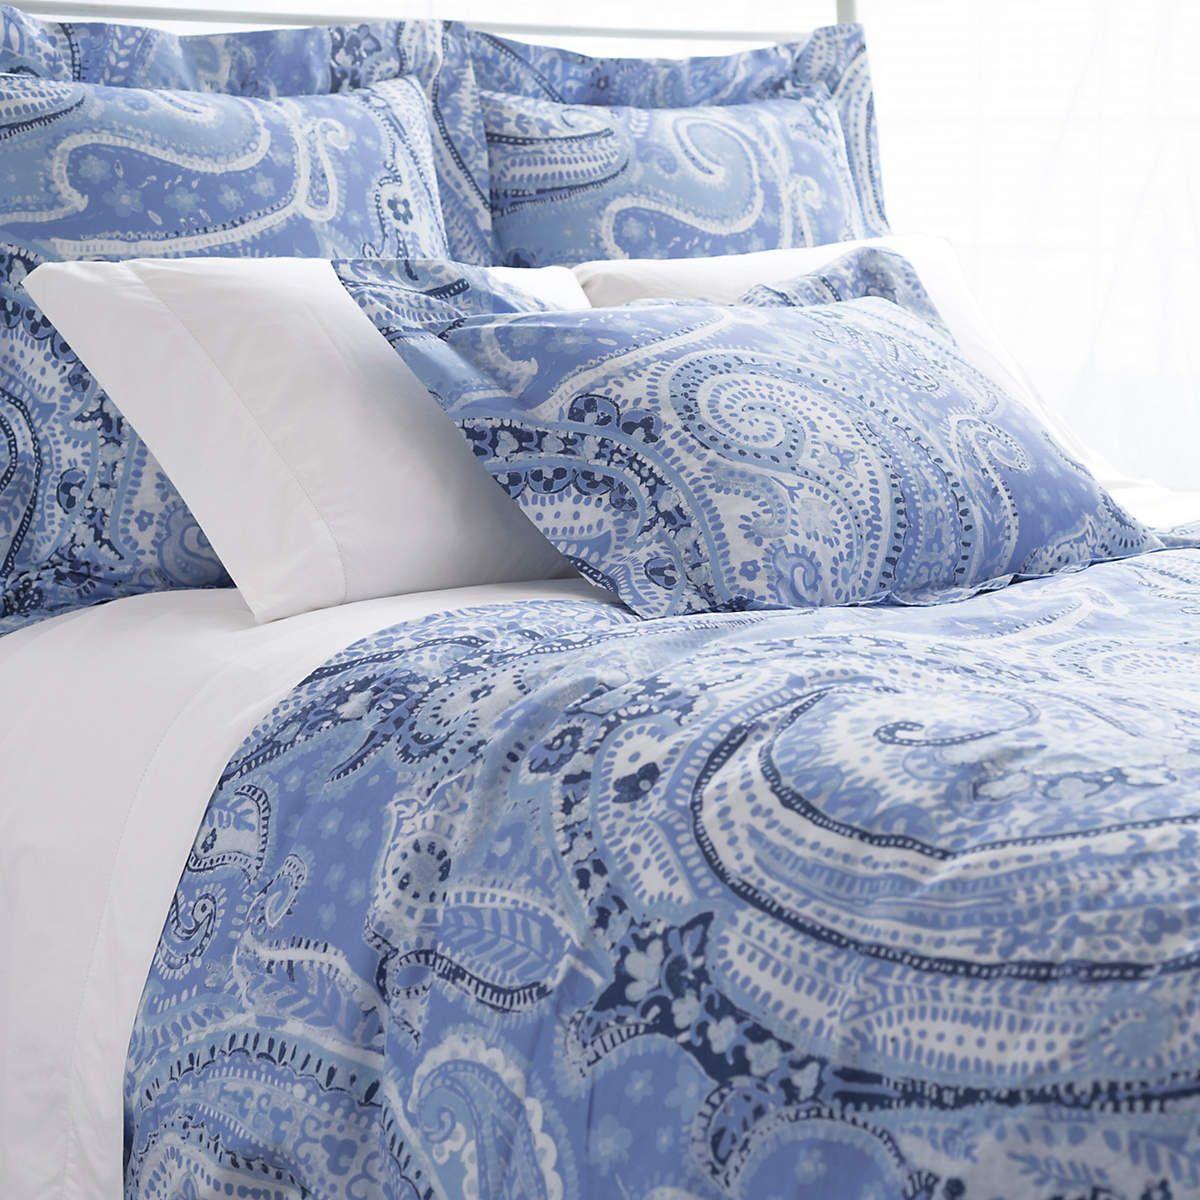 Lyric Paisley Blue Duvet Cover The Outlet Blue Paisley Bedding Blue Bedding Blue Duvet Cover